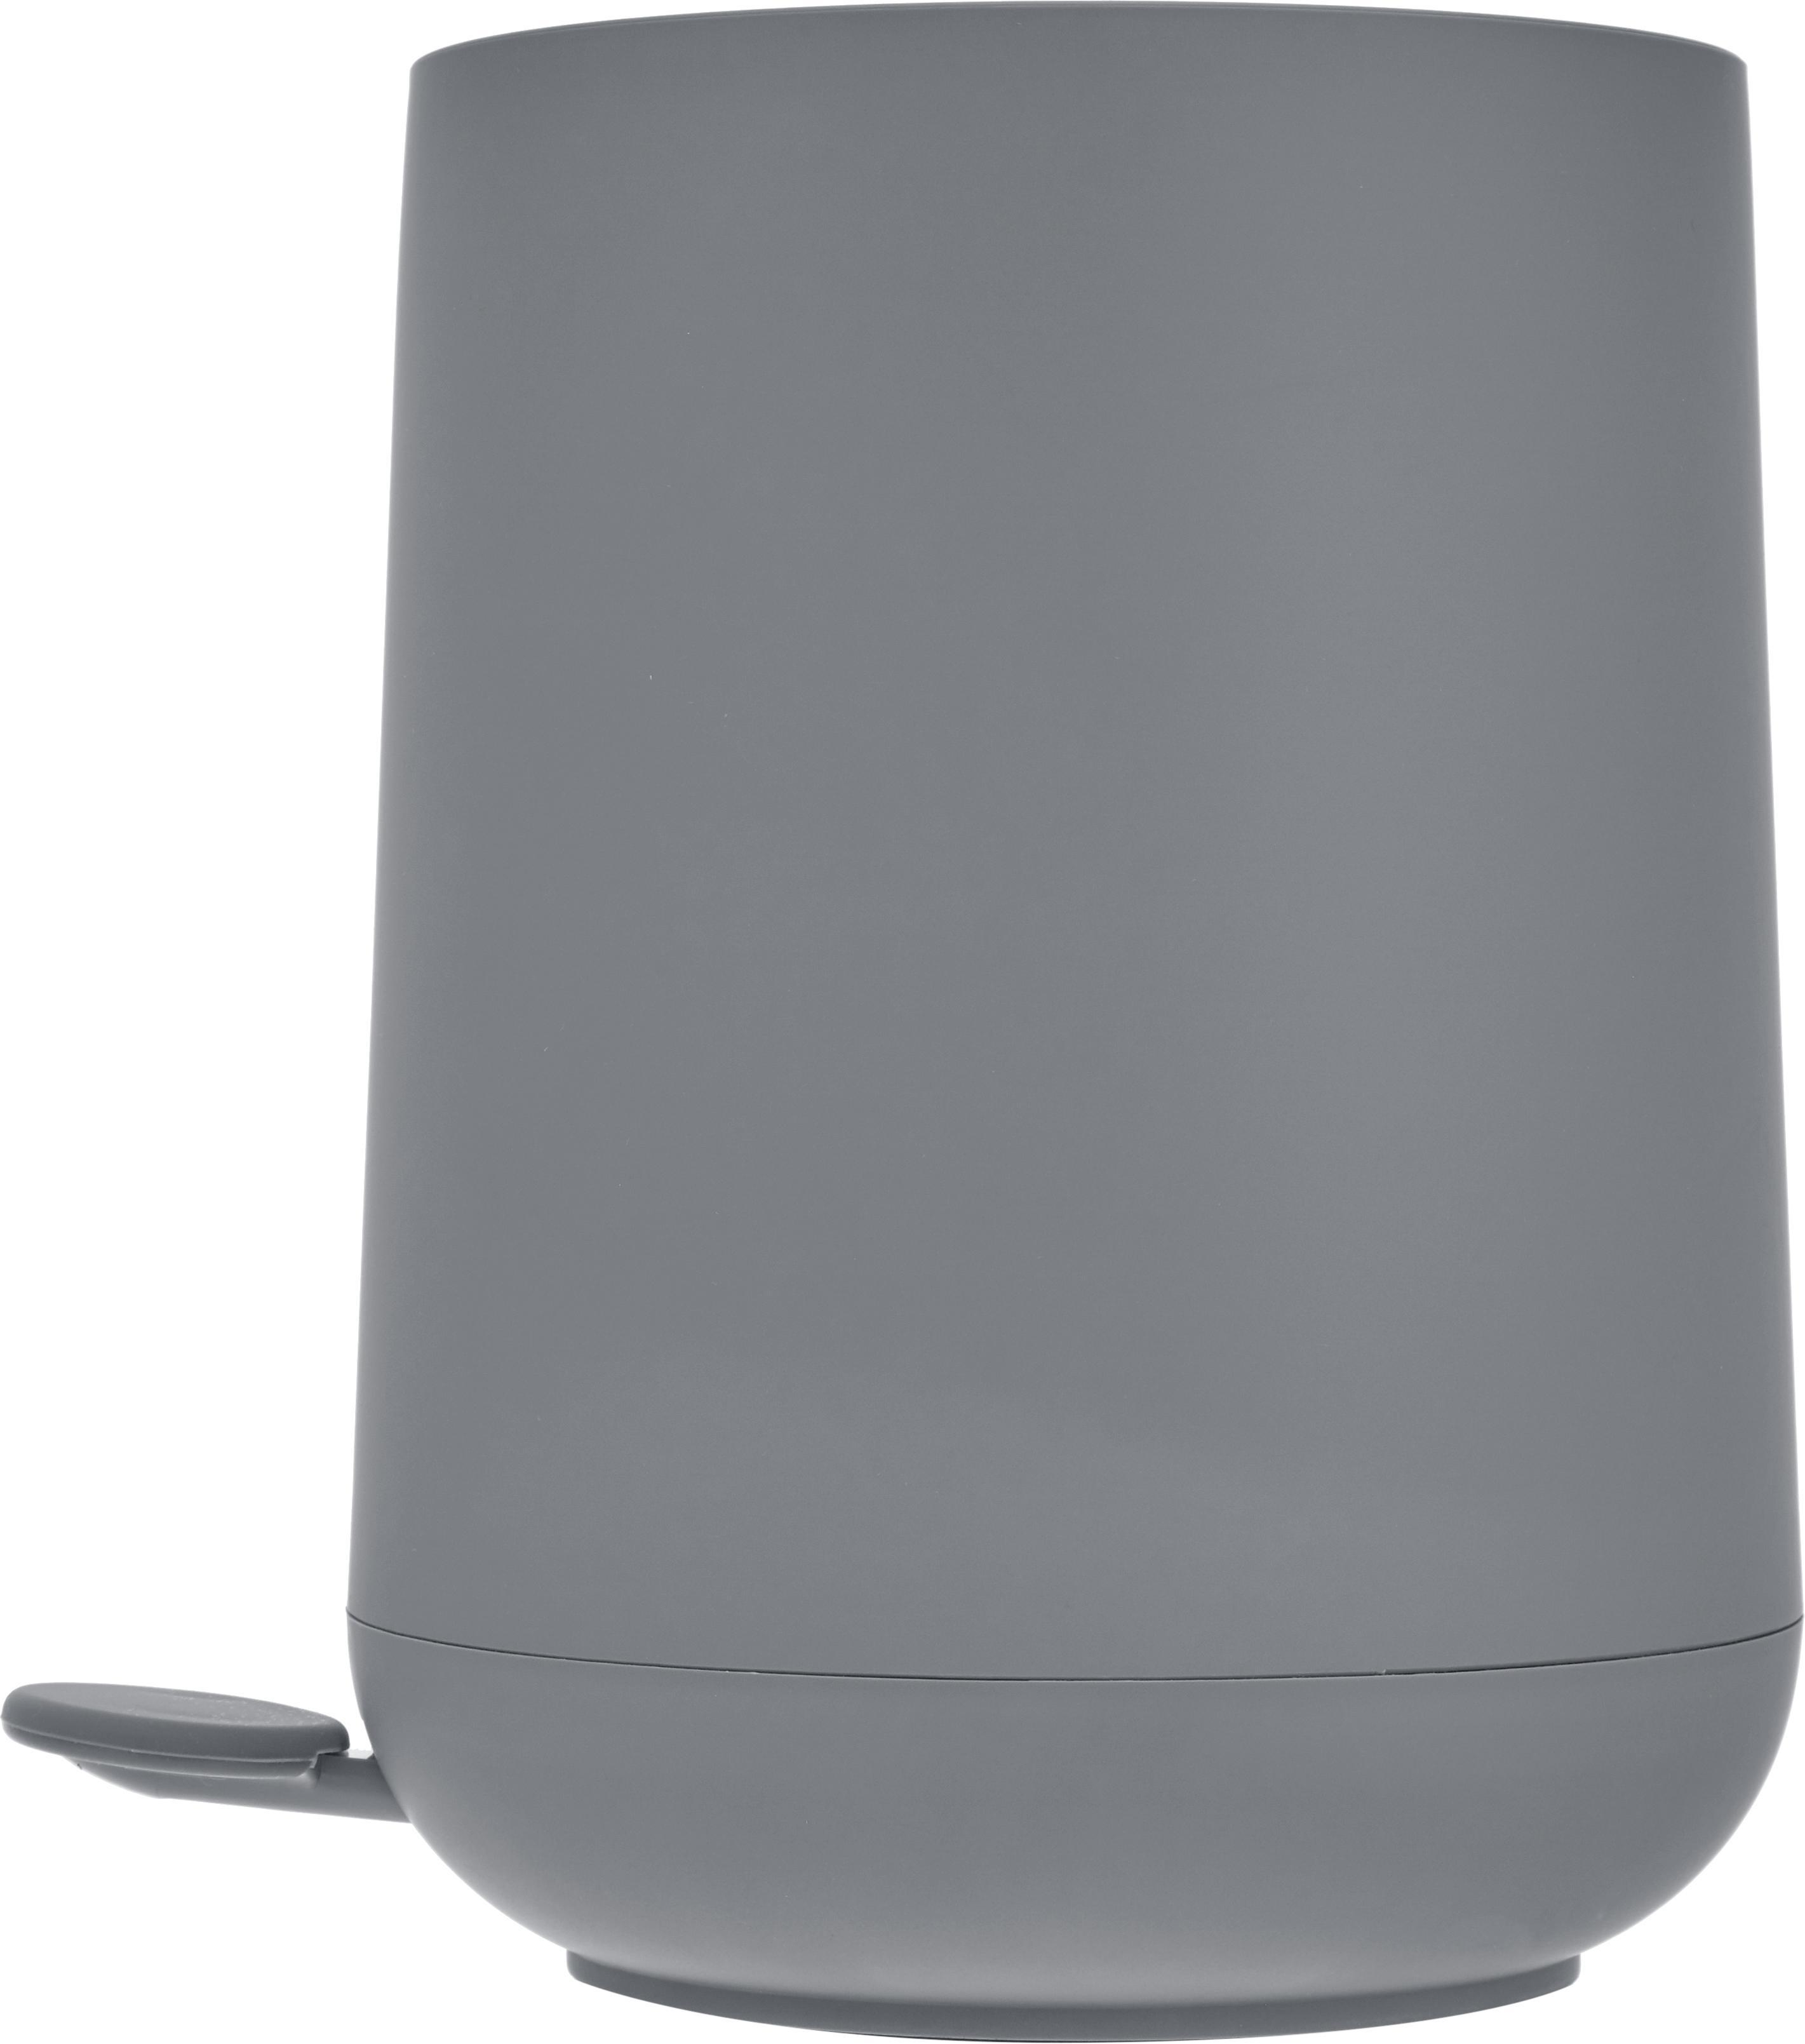 Pattumiera Nova, Materiale sintetico ABS, Grigio, Ø 23 x A 29 cm